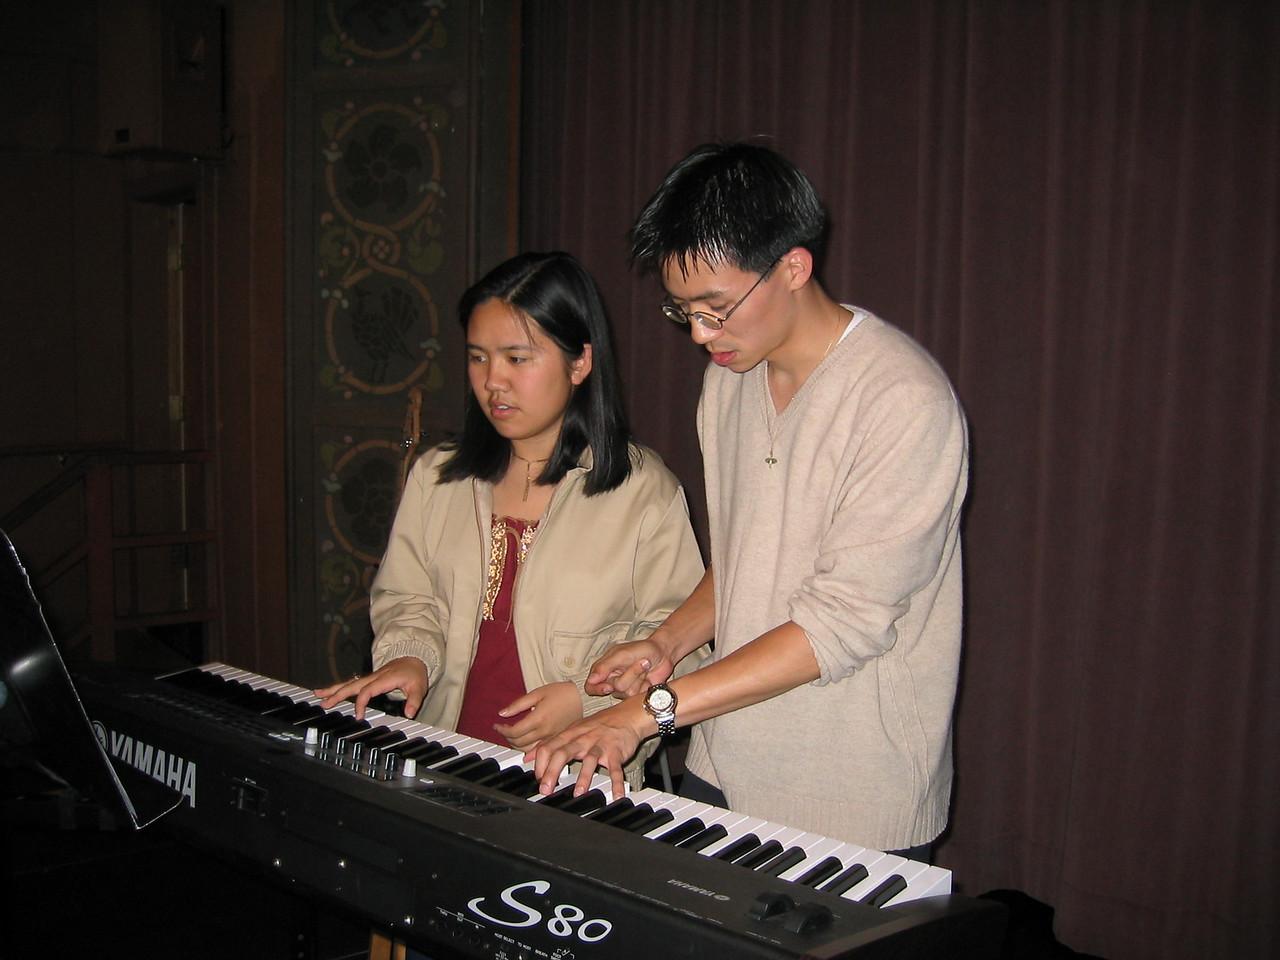 Sibs on the keys @ Berkeley Mosaic, Sunday 6 1 2003